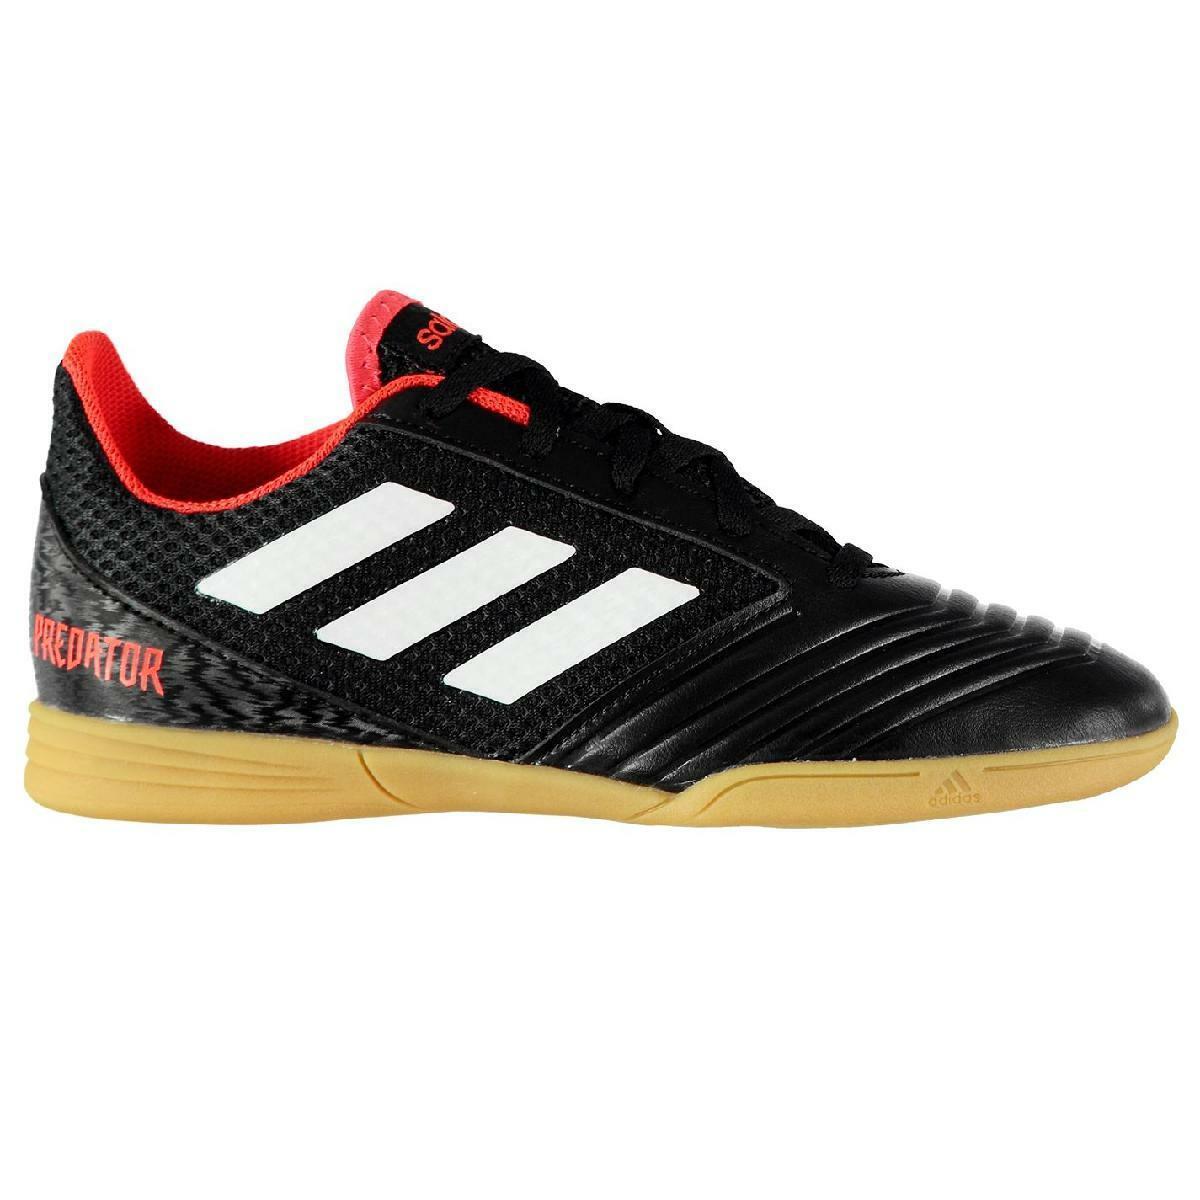 Adidas Protator 18 4 Hallenschuhe Fußballschuhe Fußballschuhe Fußballschuhe Kinder Indoor Fussball 5219 8c4268